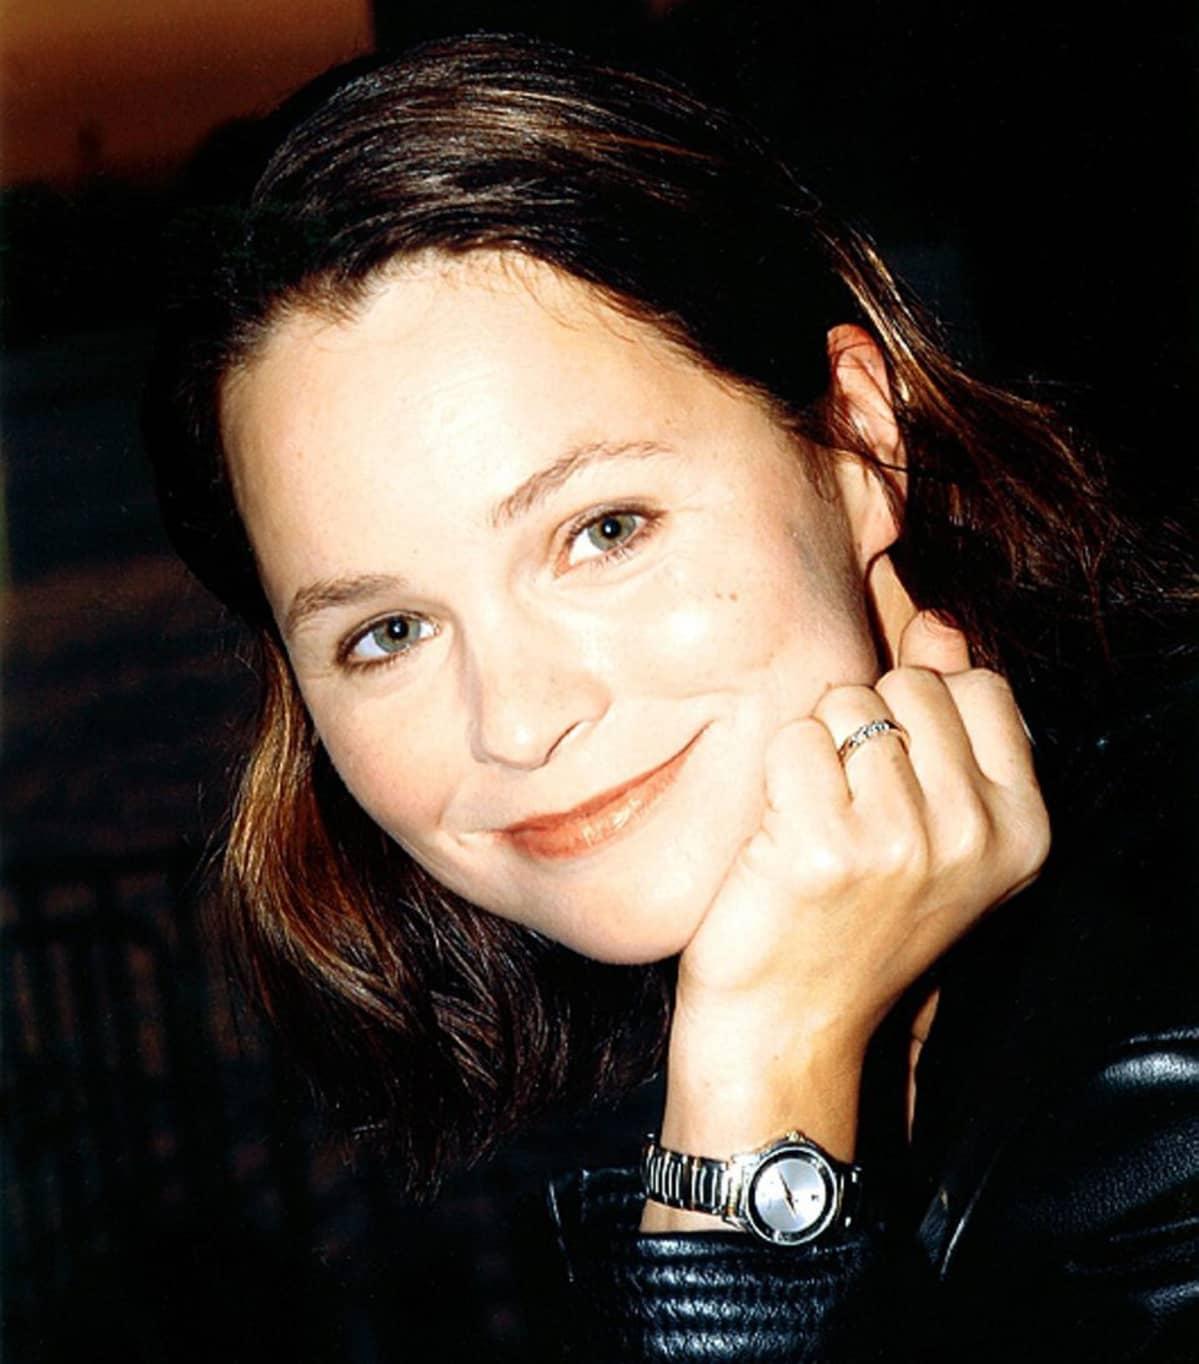 Marjo Nurminen